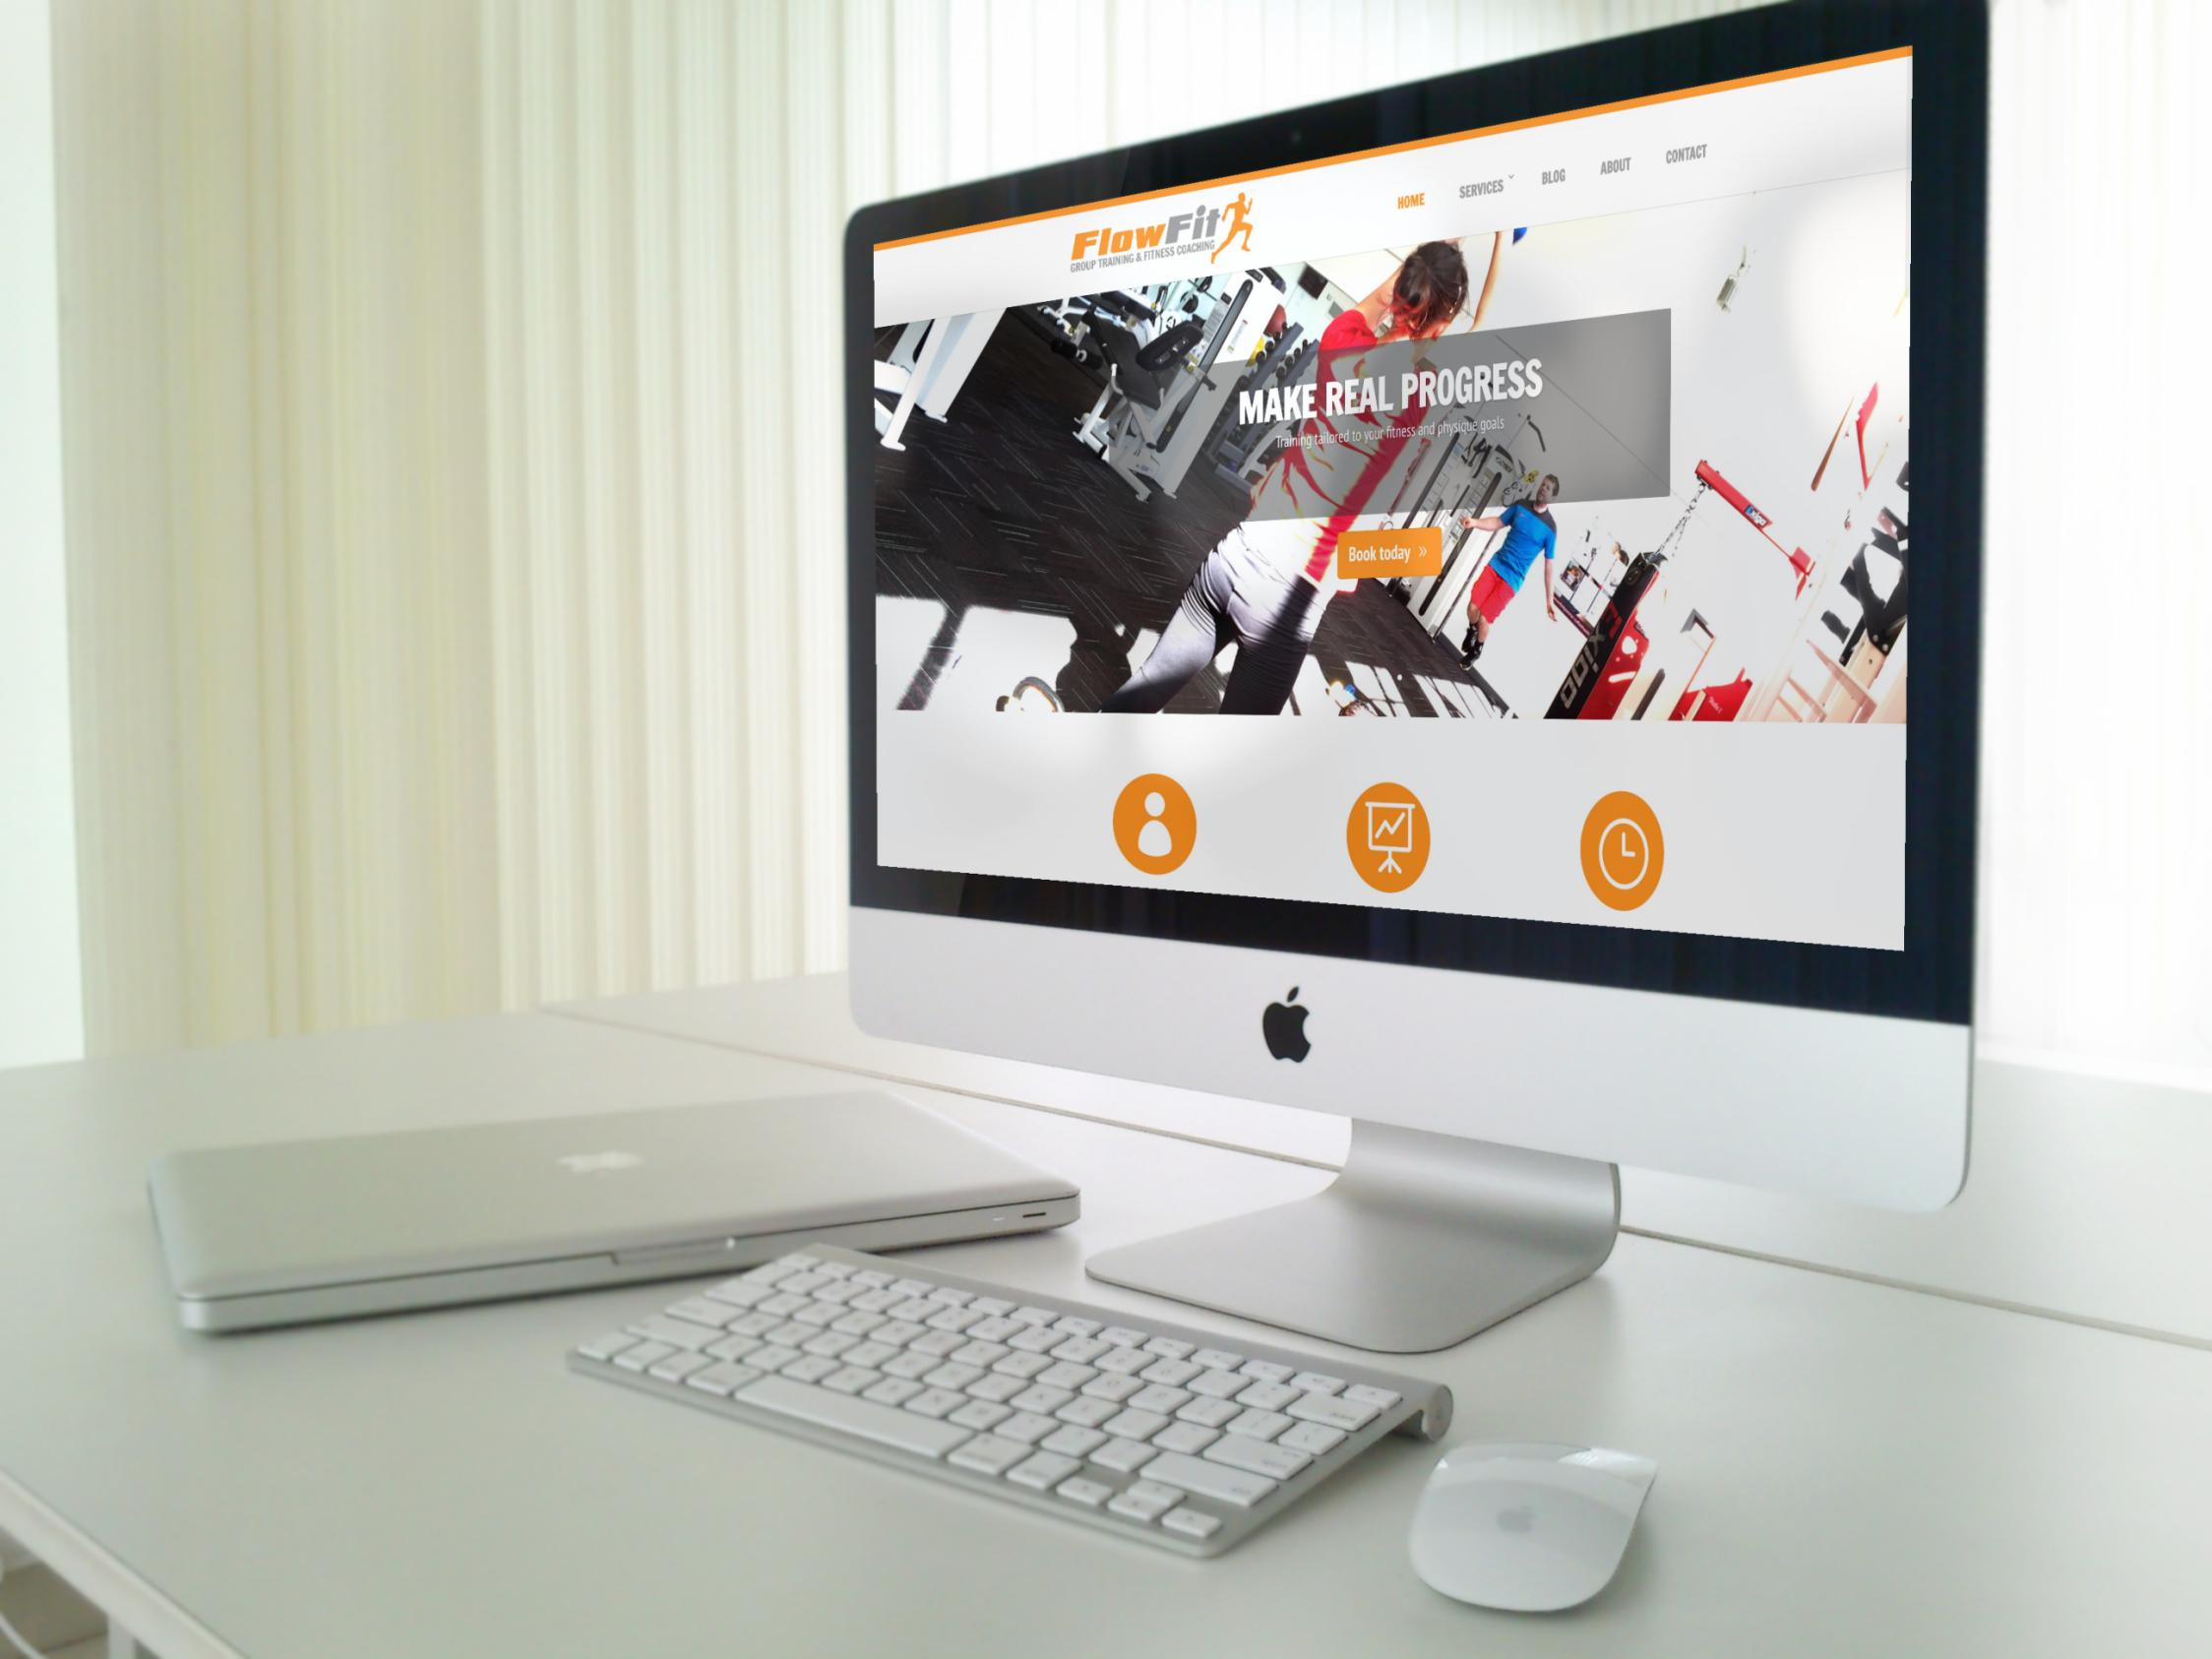 ffit website mockup1 - Fitness & gym graphic design services